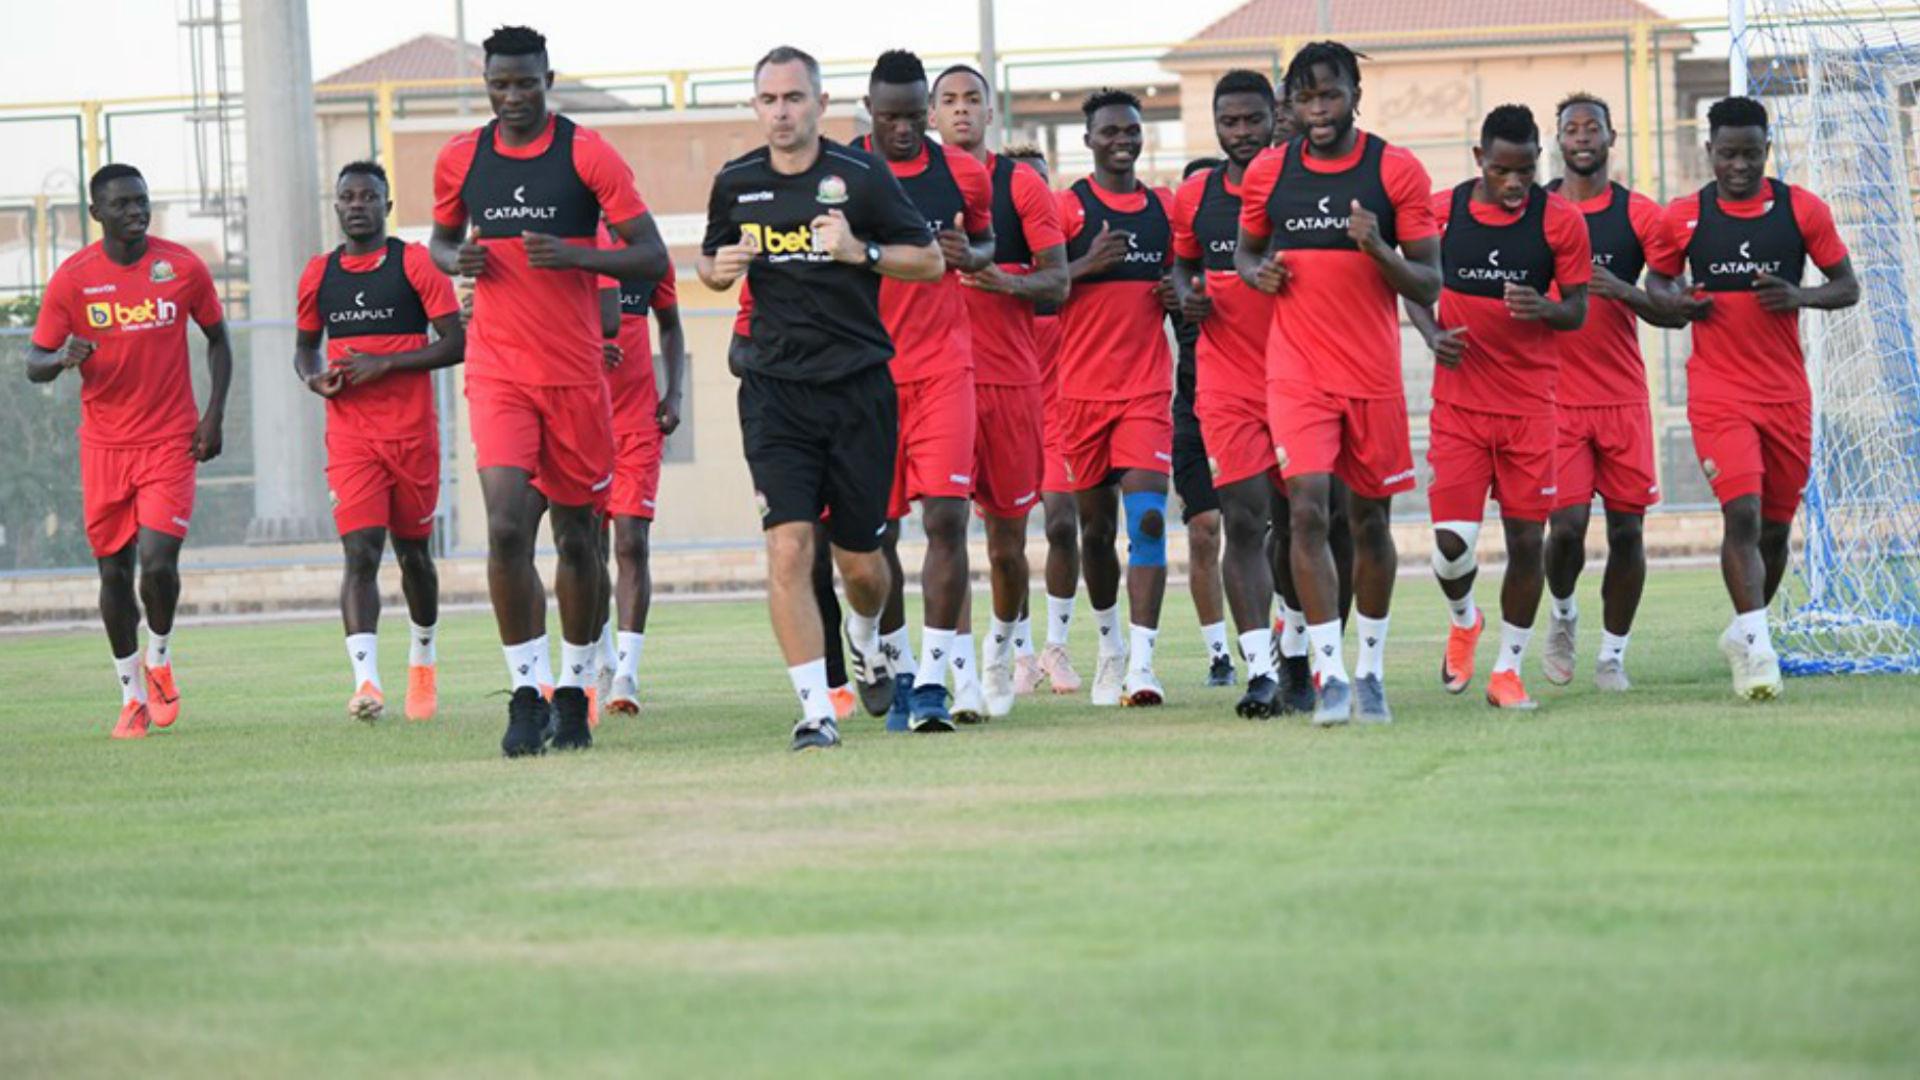 Afcon 2019: Kenya prepared well but fell short - Wanyama